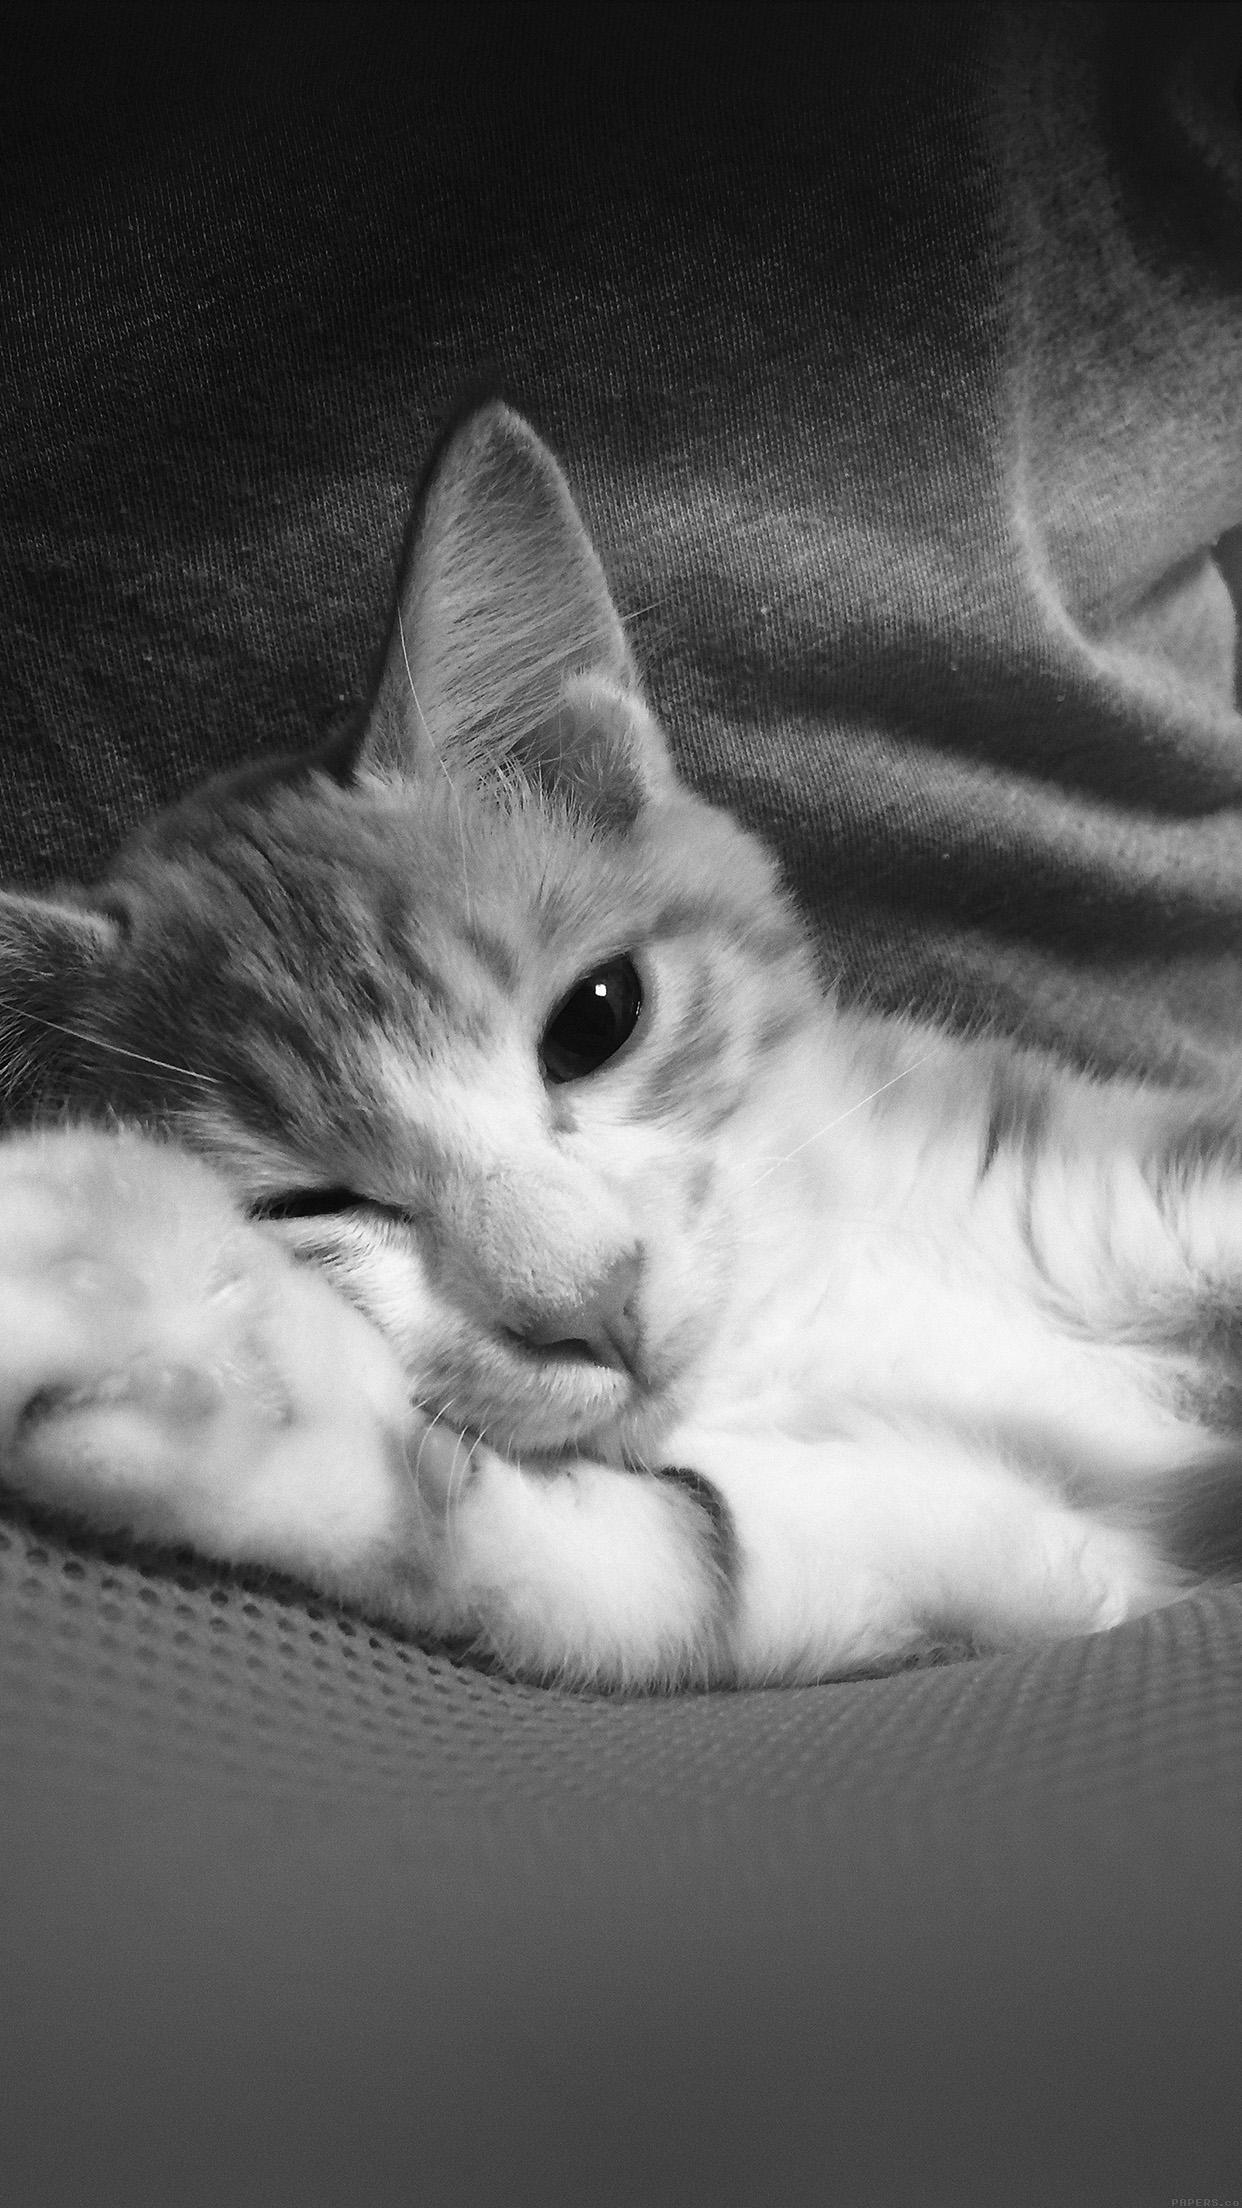 Mp45 Nyangmi Cat Cute Animal Dark Papers Co